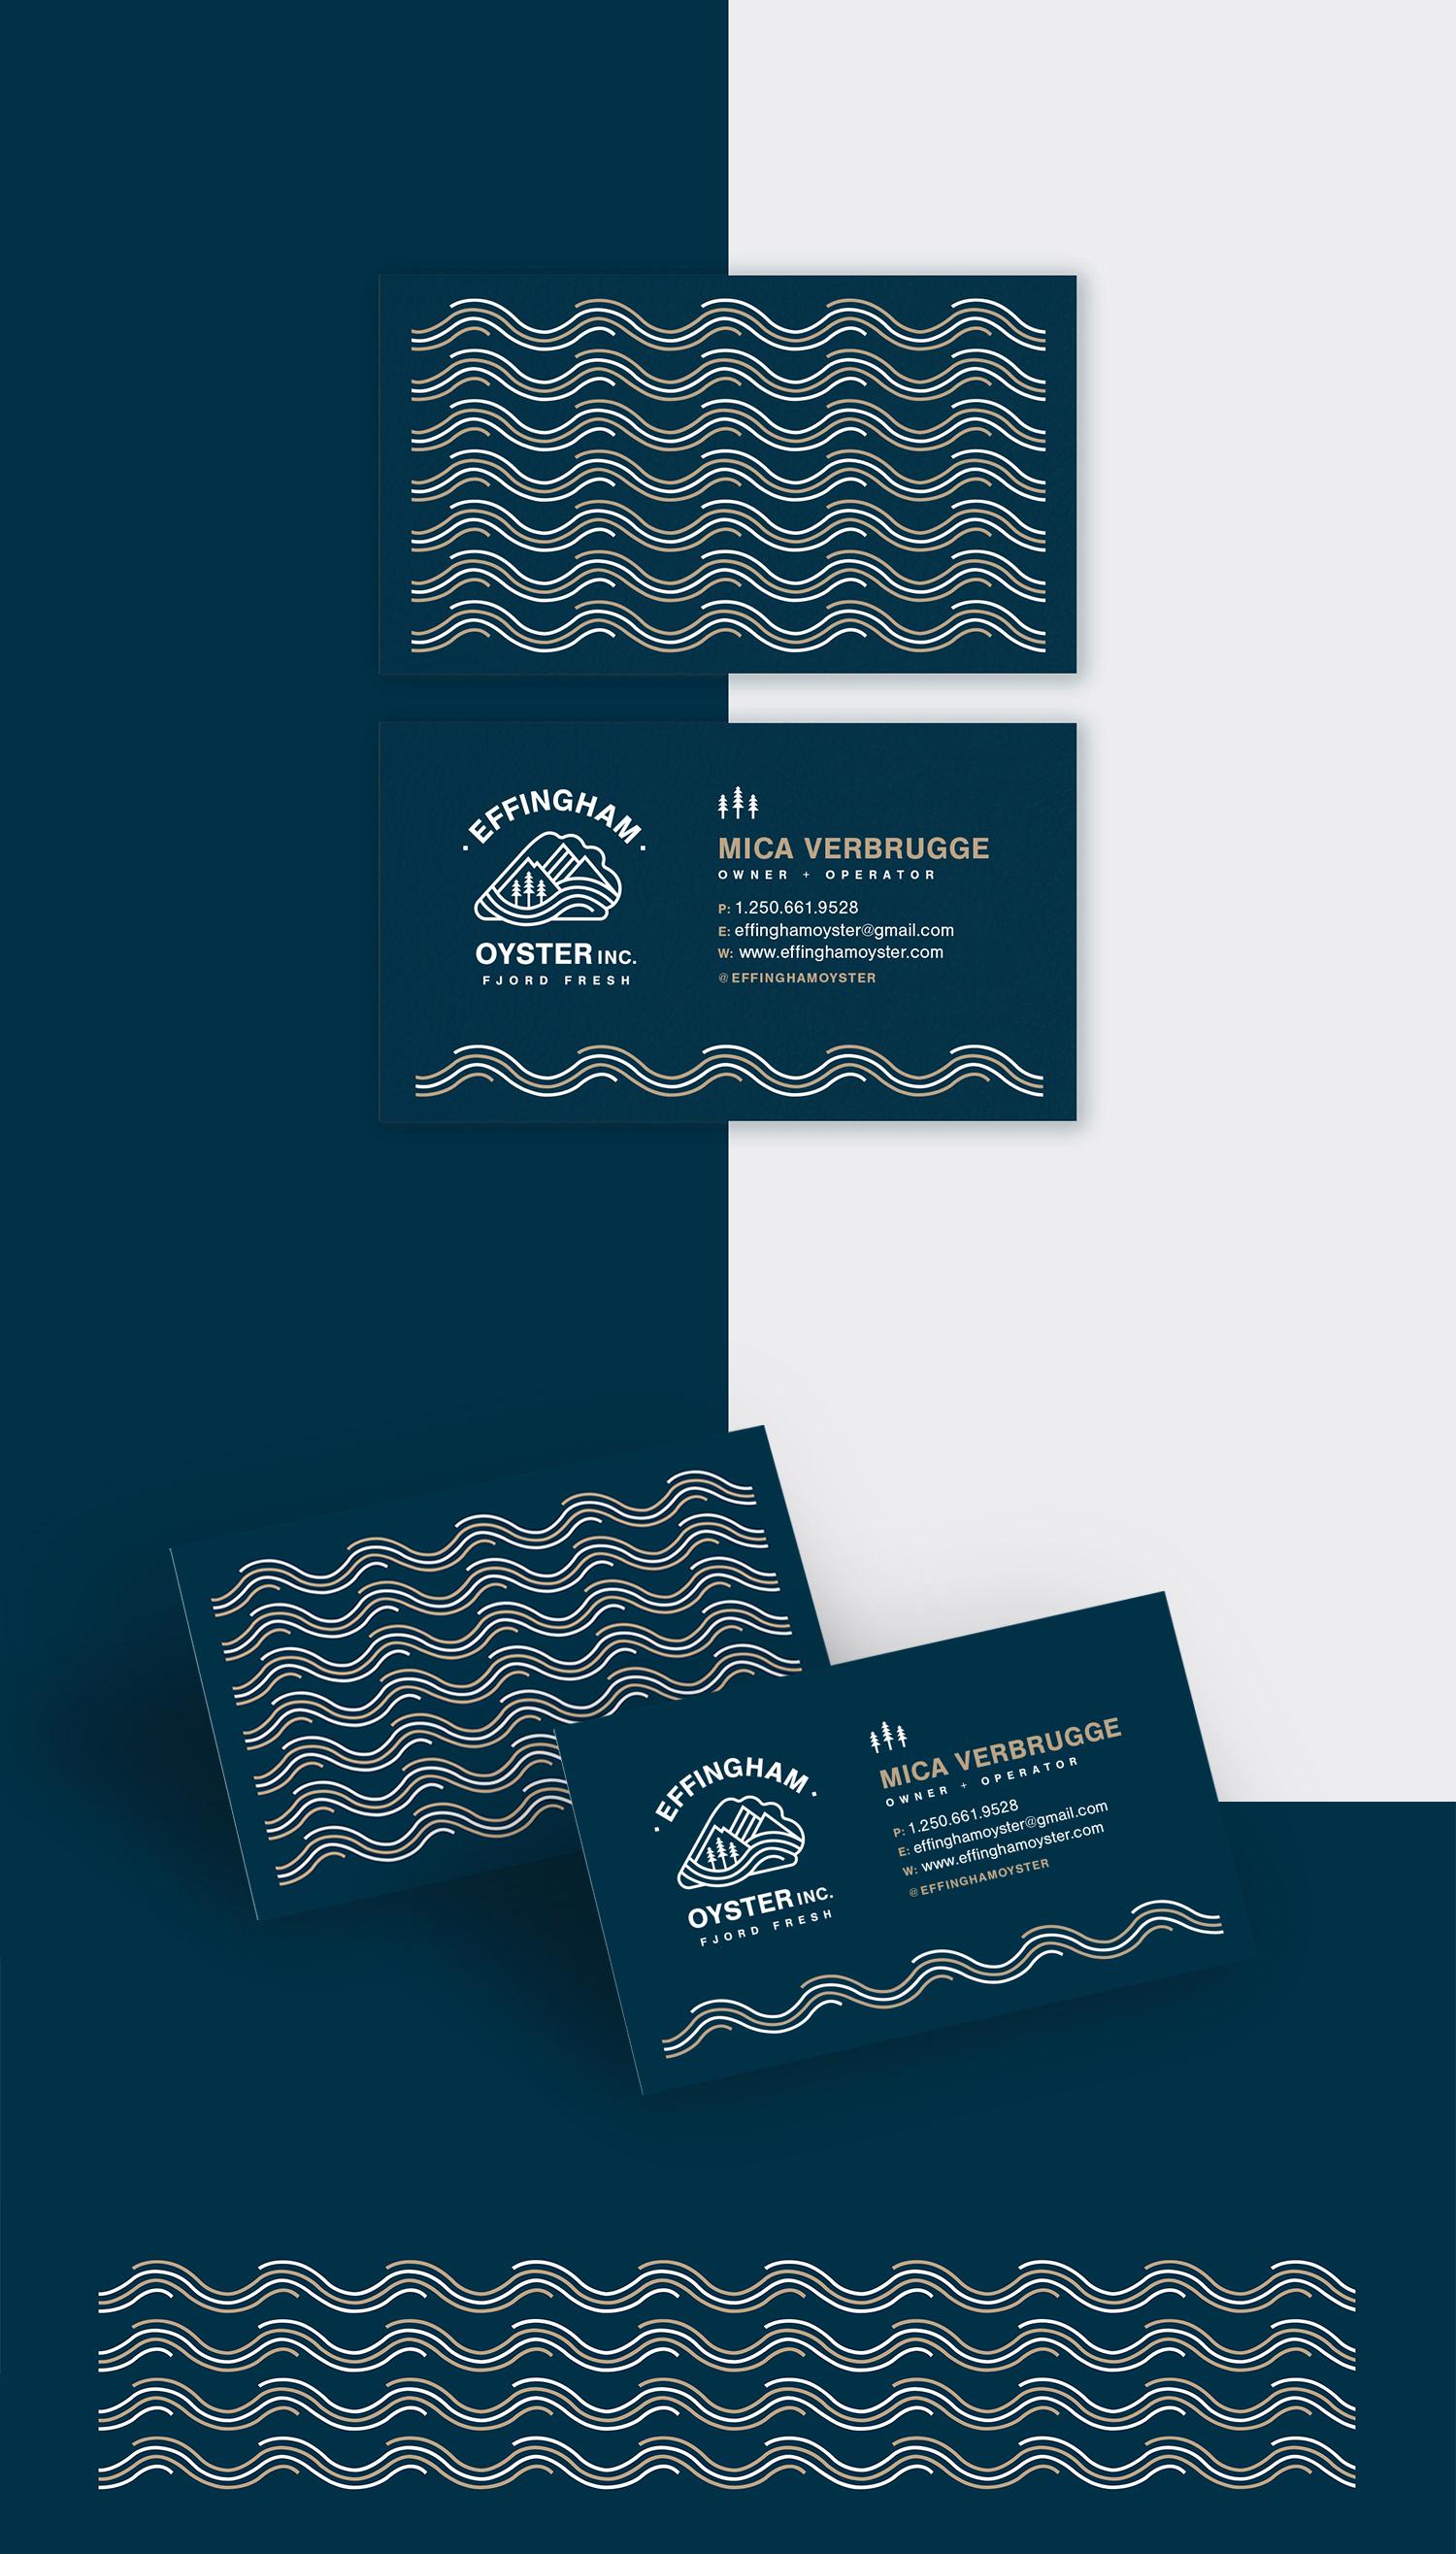 businesscards4.jpg